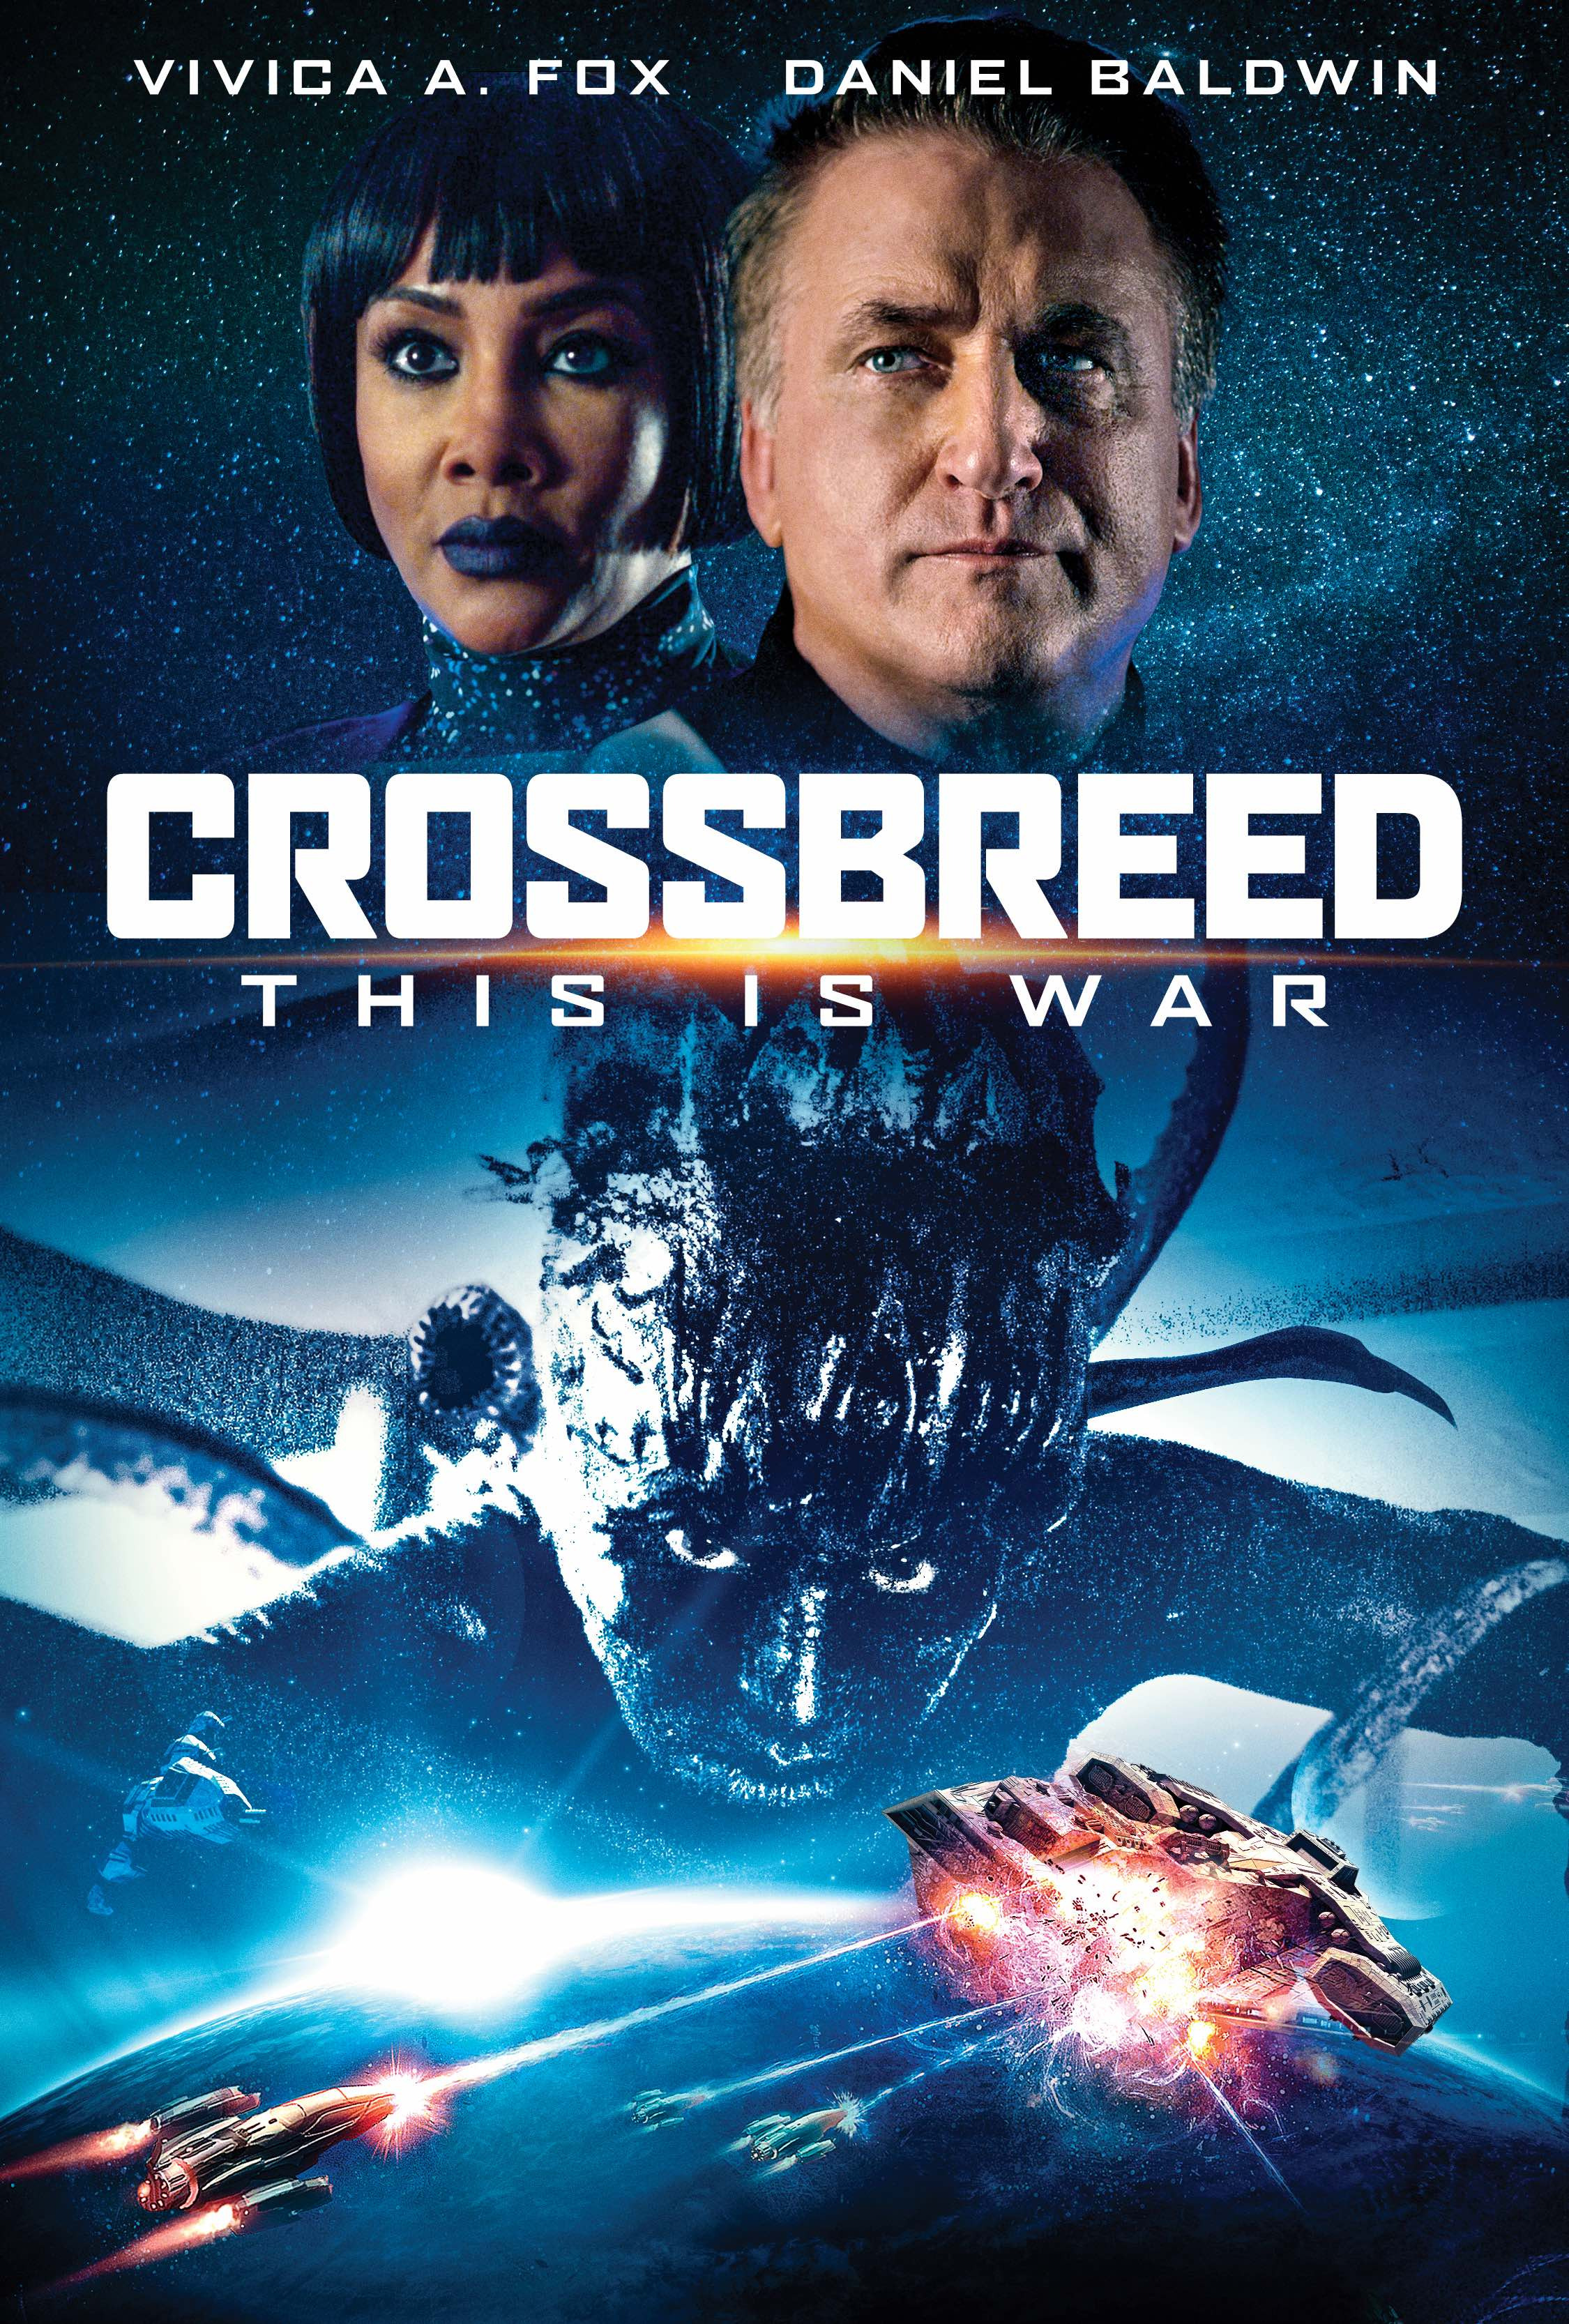 Brandon Slagle, Vivica A Fox Crossbreed, Crossbreed Trailer, Vivica A. Fox